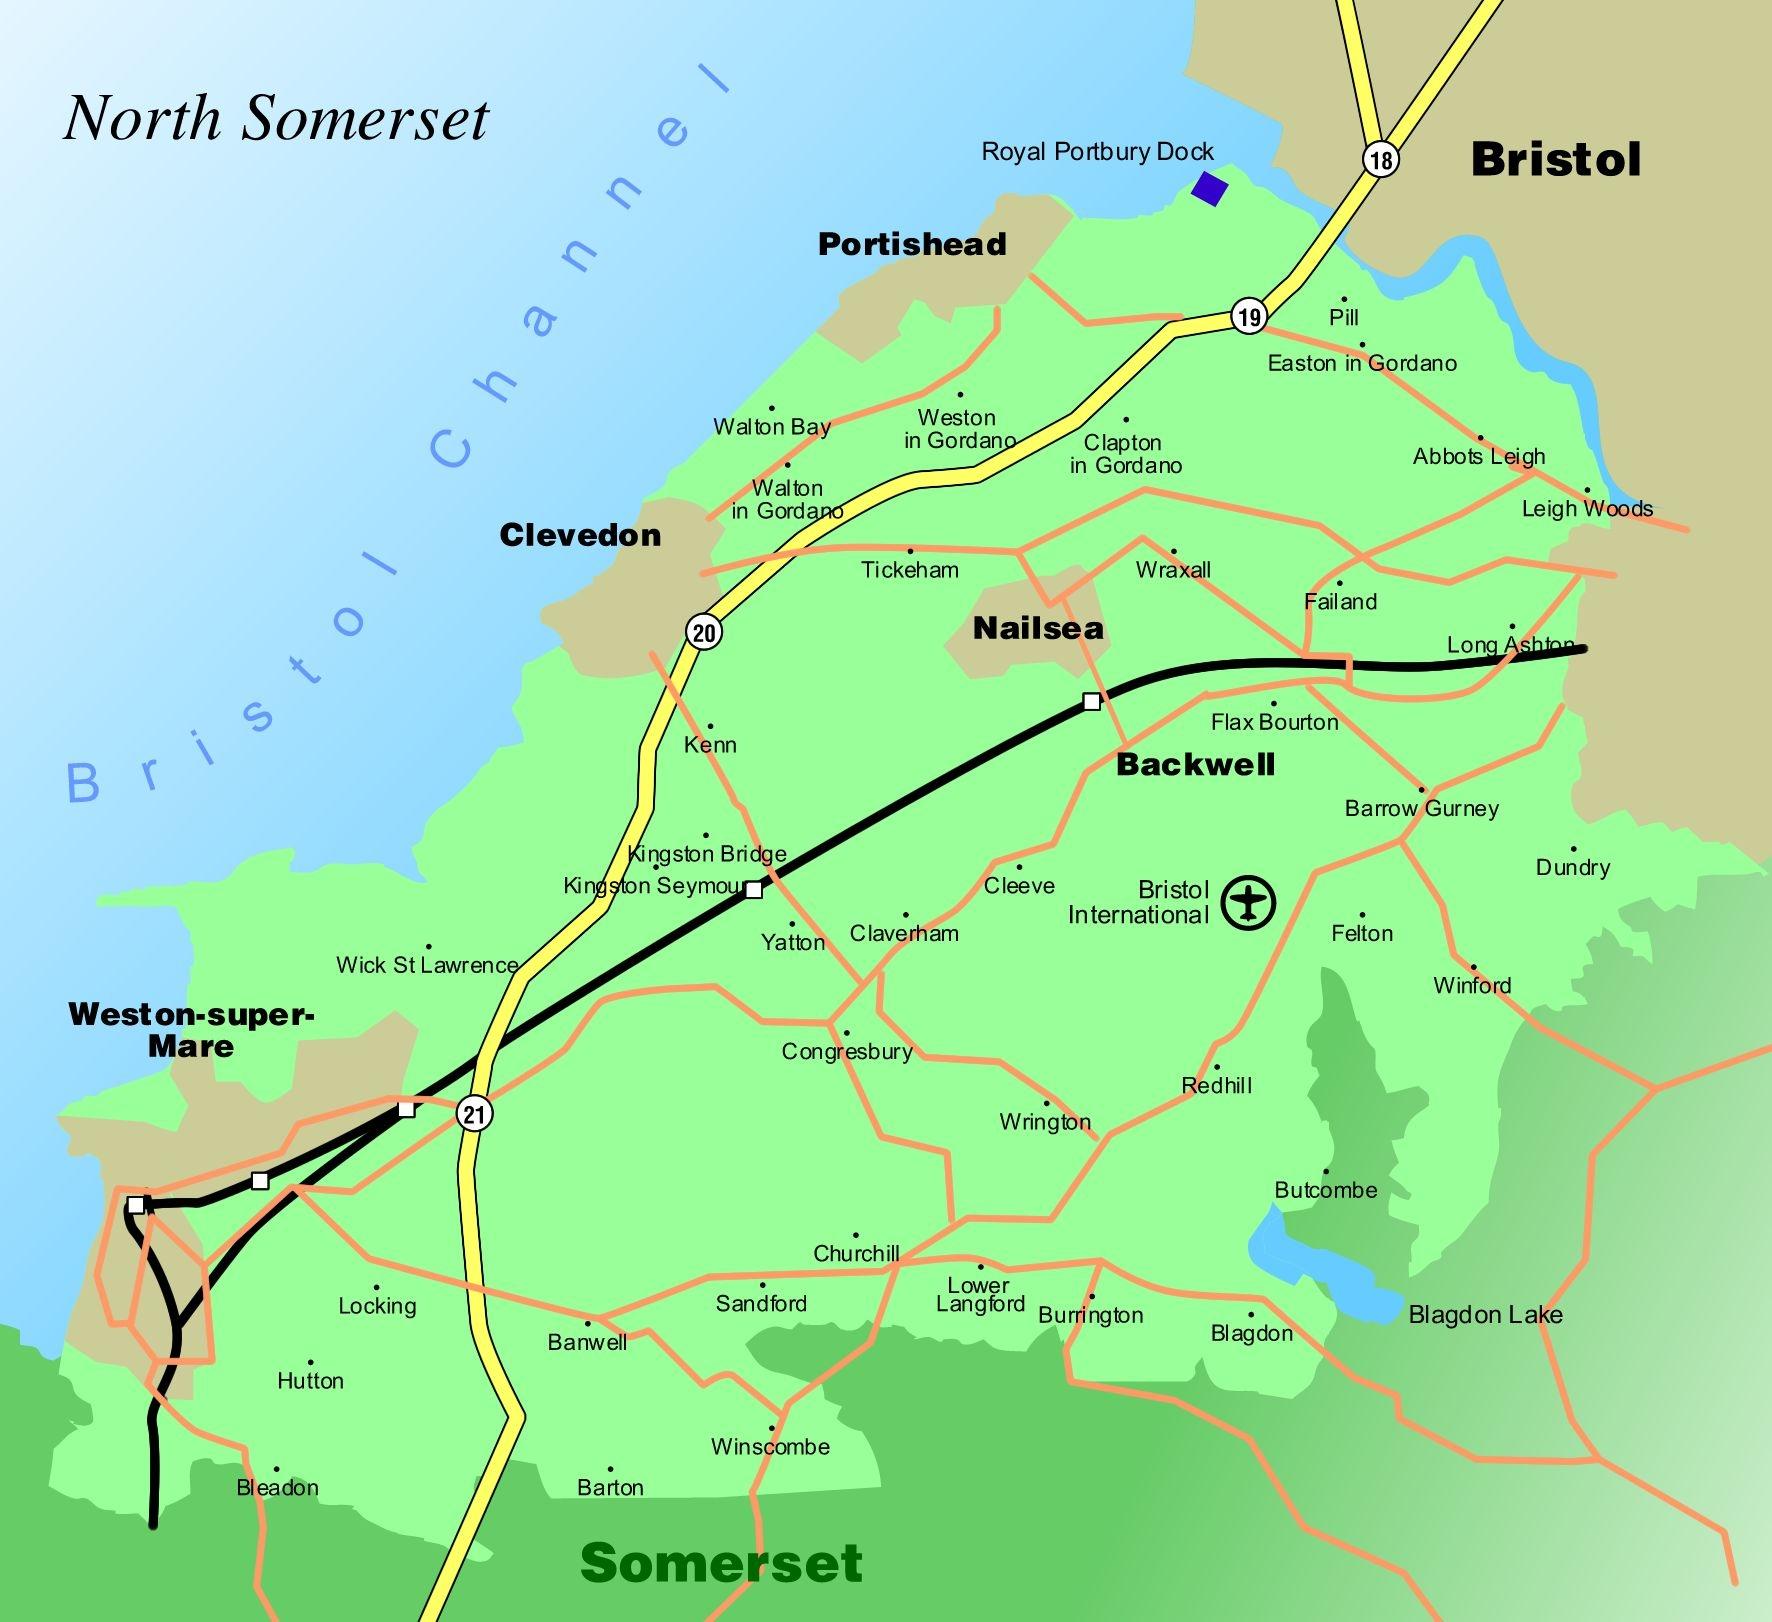 north somerset - photo #3